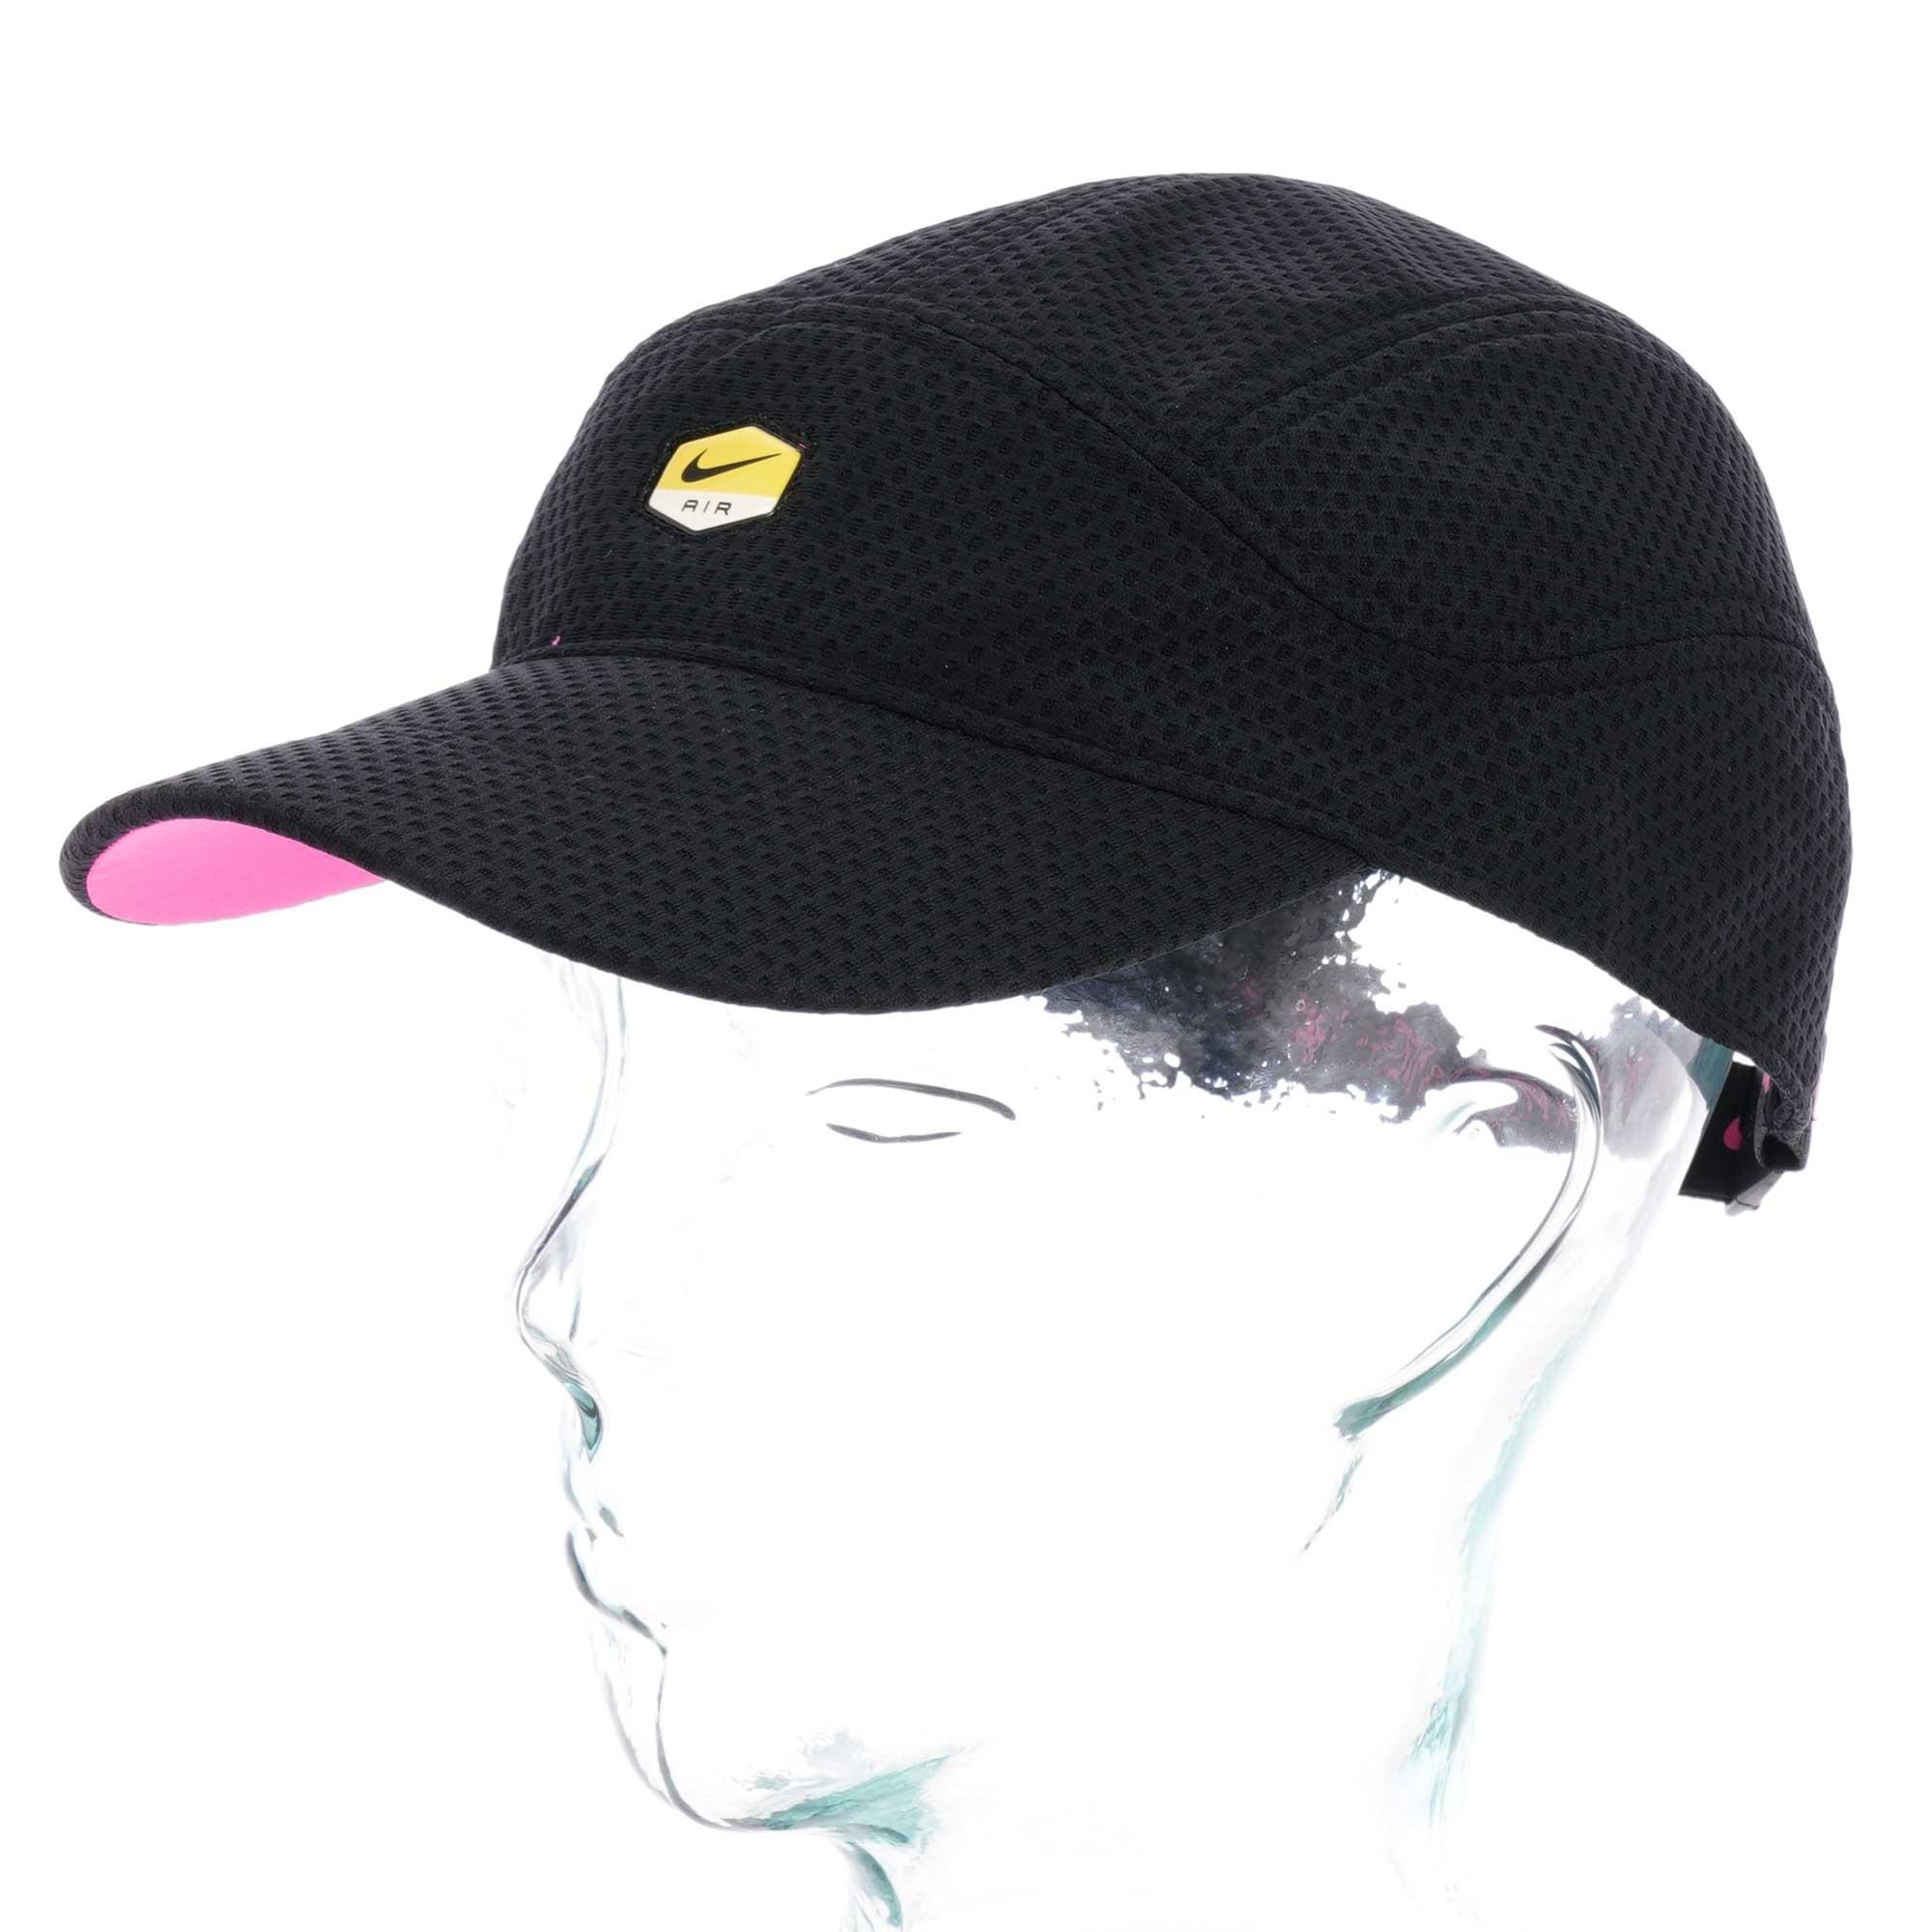 286c55493bb262 Lyst - Nike Tn Air Aerobill Cap - Black in Black for Men